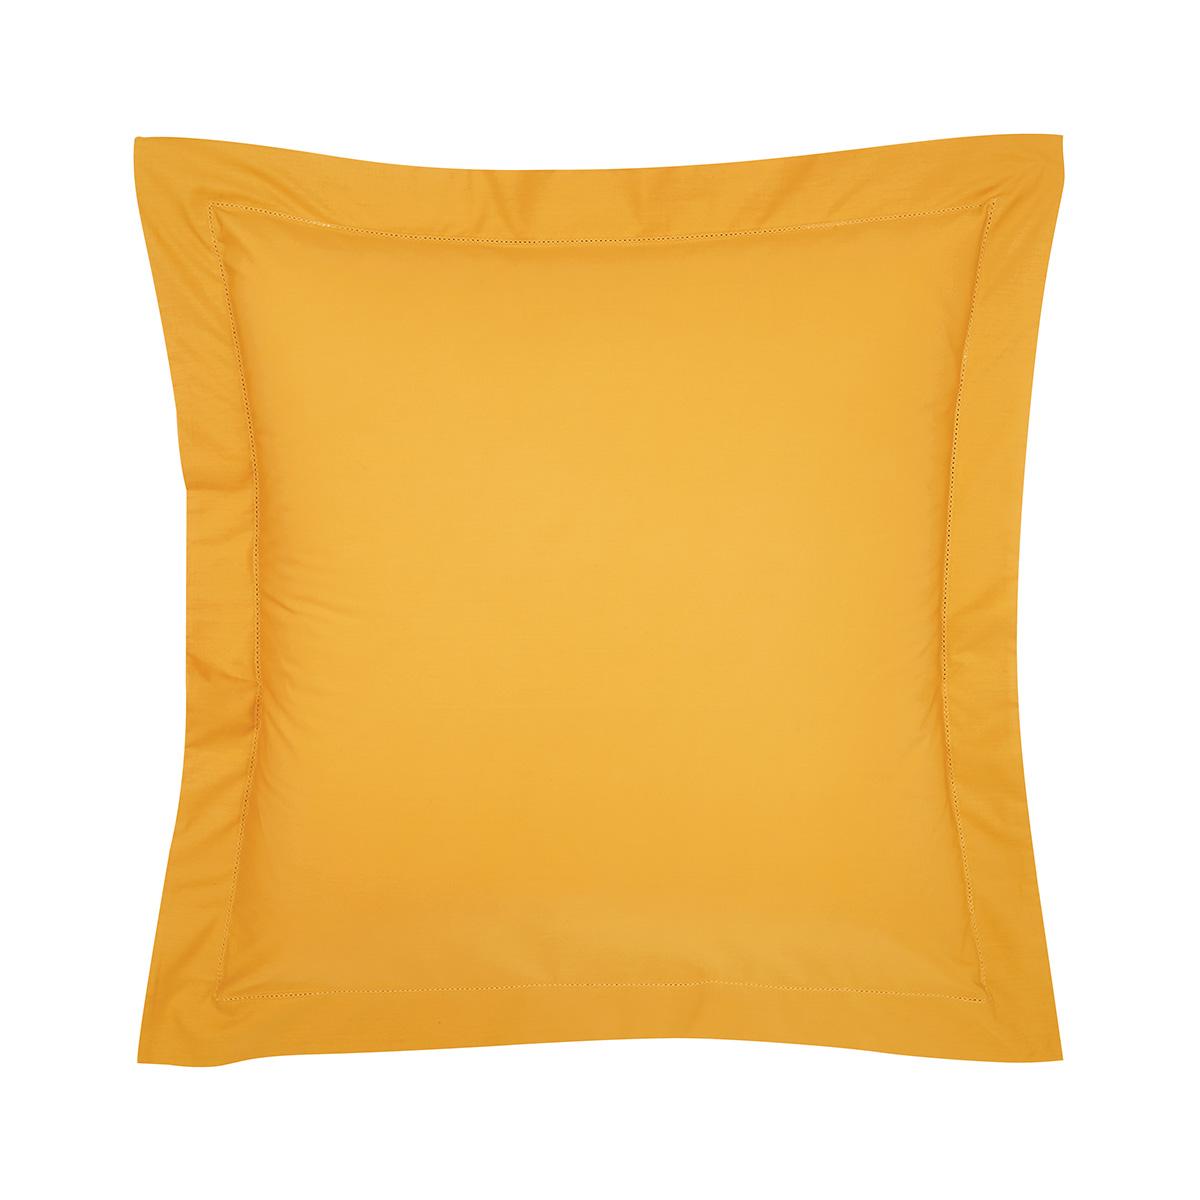 Taie d'oreiller percale Orange 65 x 65 cm